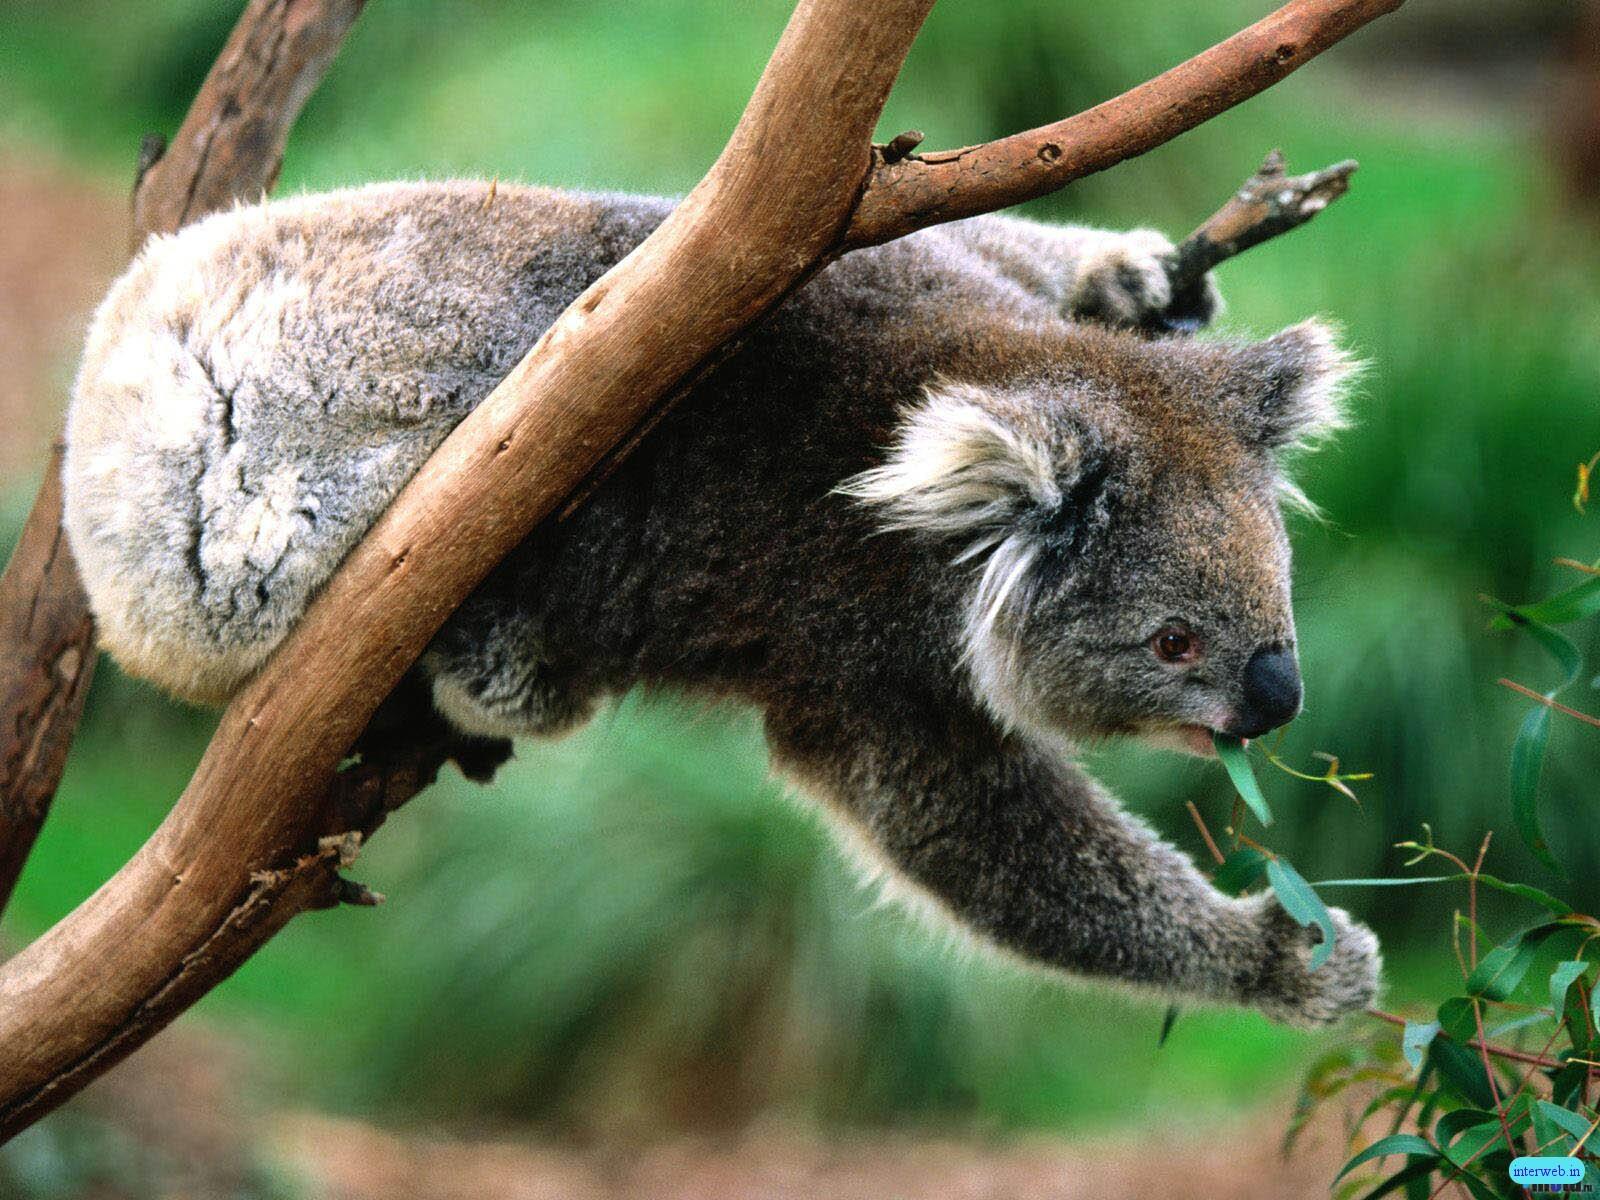 http://4.bp.blogspot.com/-gUFKqAuSq1A/Td0XR8LTpTI/AAAAAAAAA34/RvxYSKdlebE/s1600/animals+Images.jpg